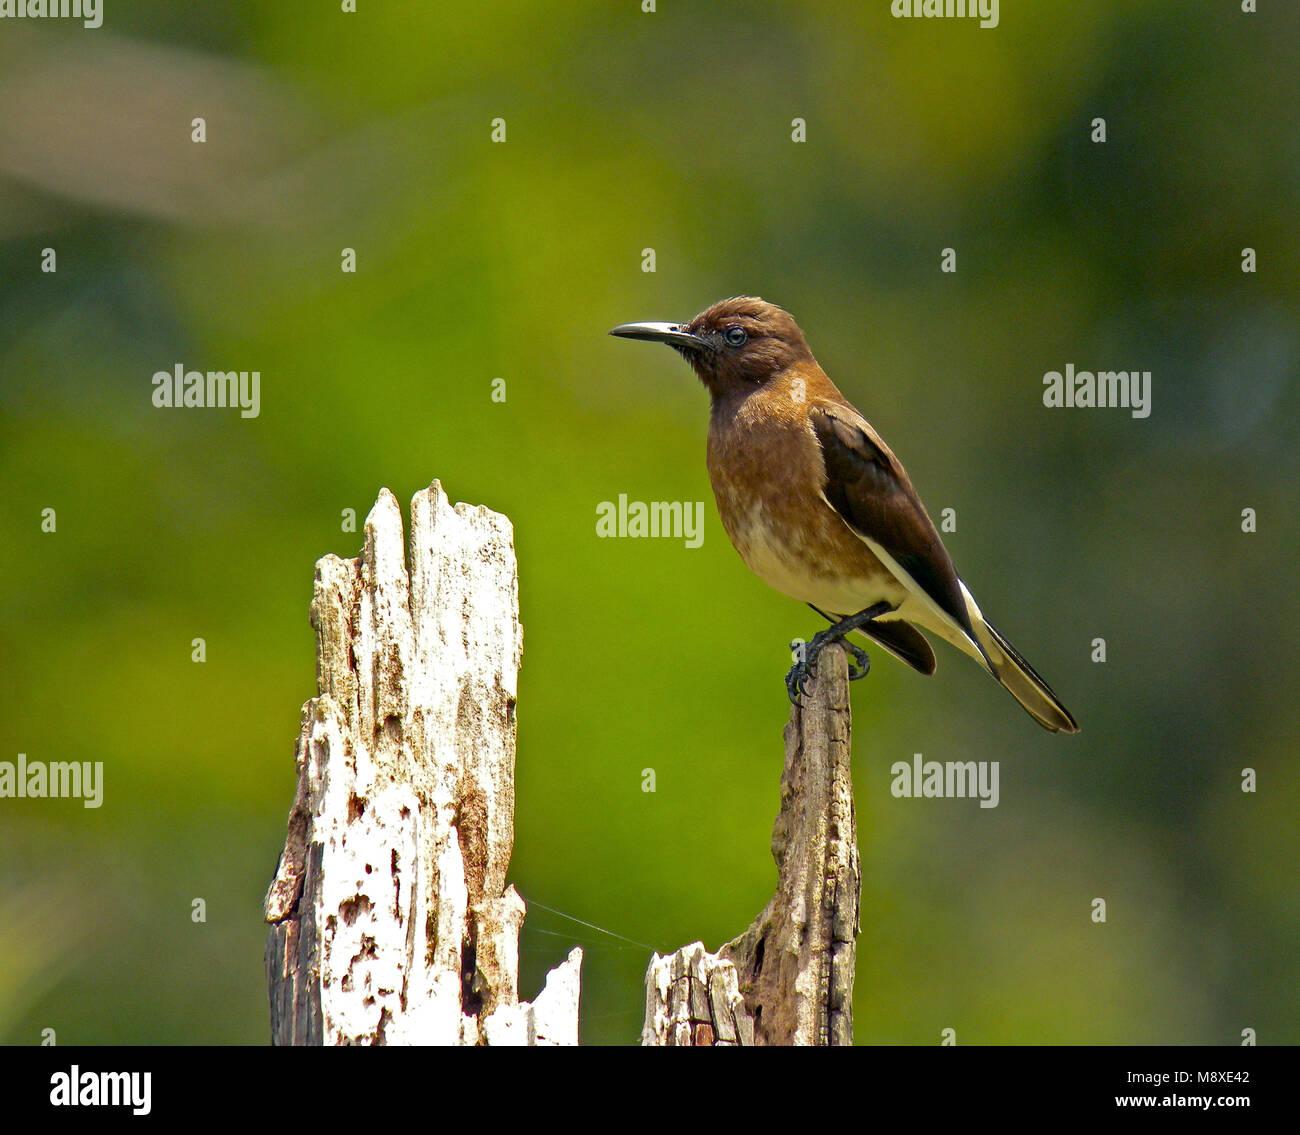 Madagaskarspreeuw, Madagascan starling - Stock Image